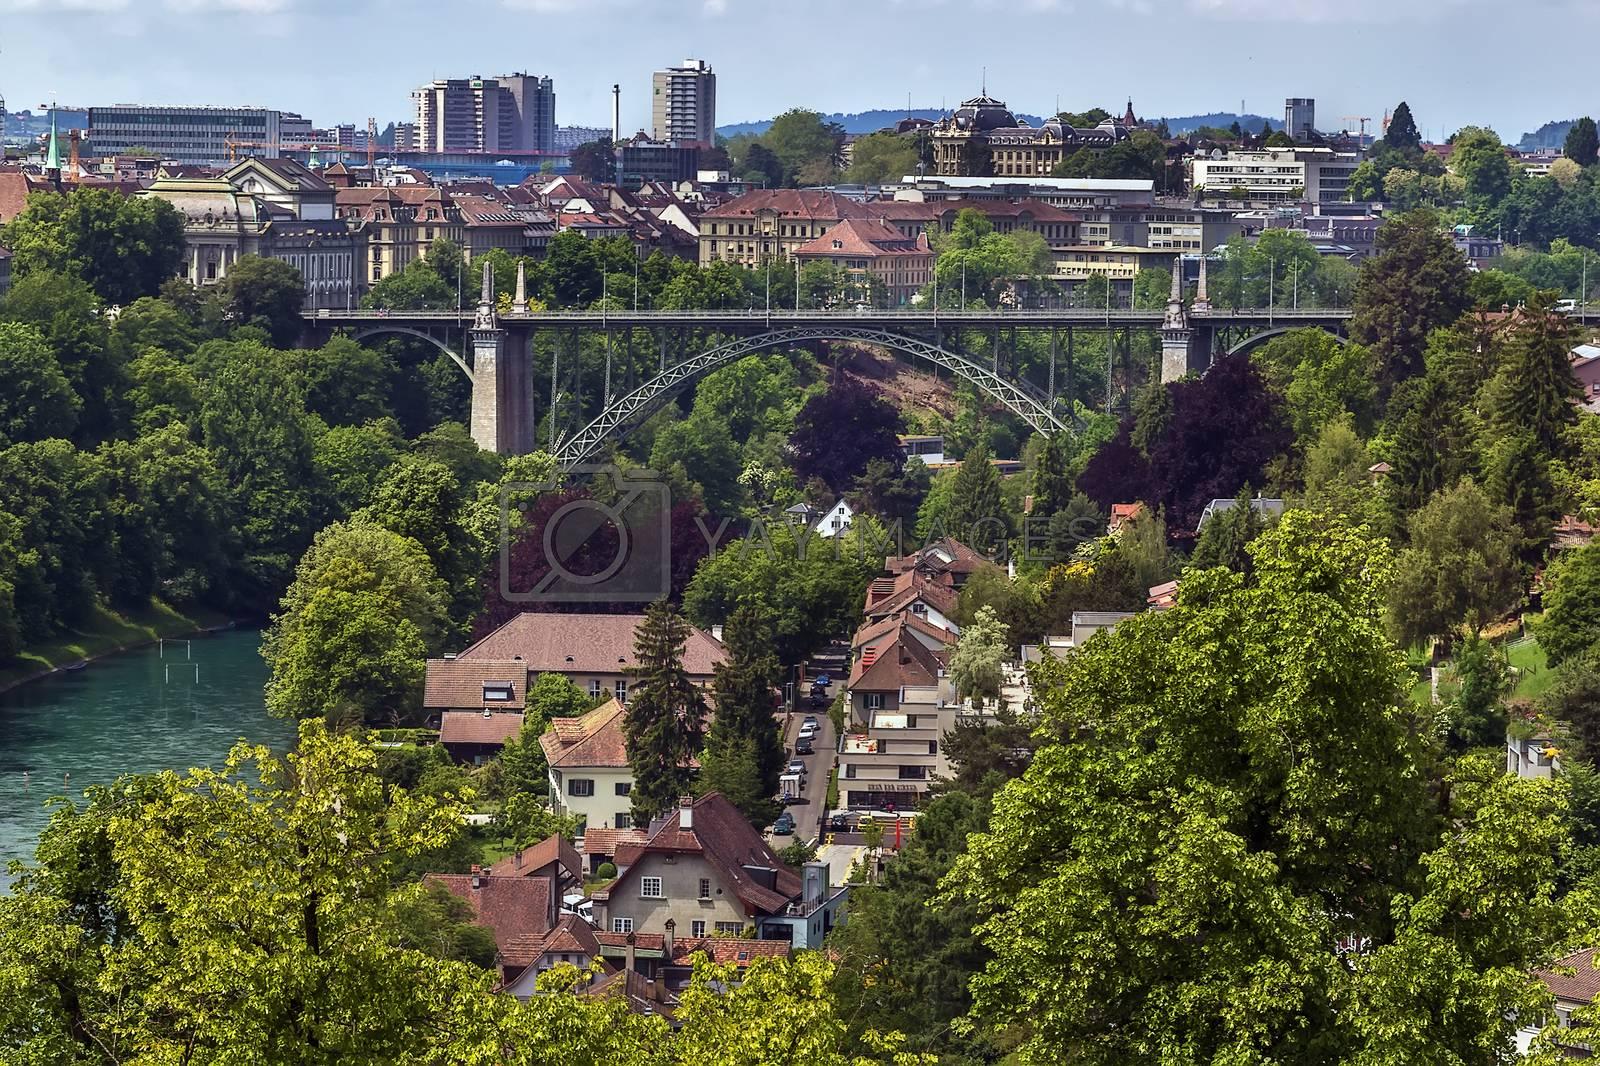 Bern, Switzerland by borisb17